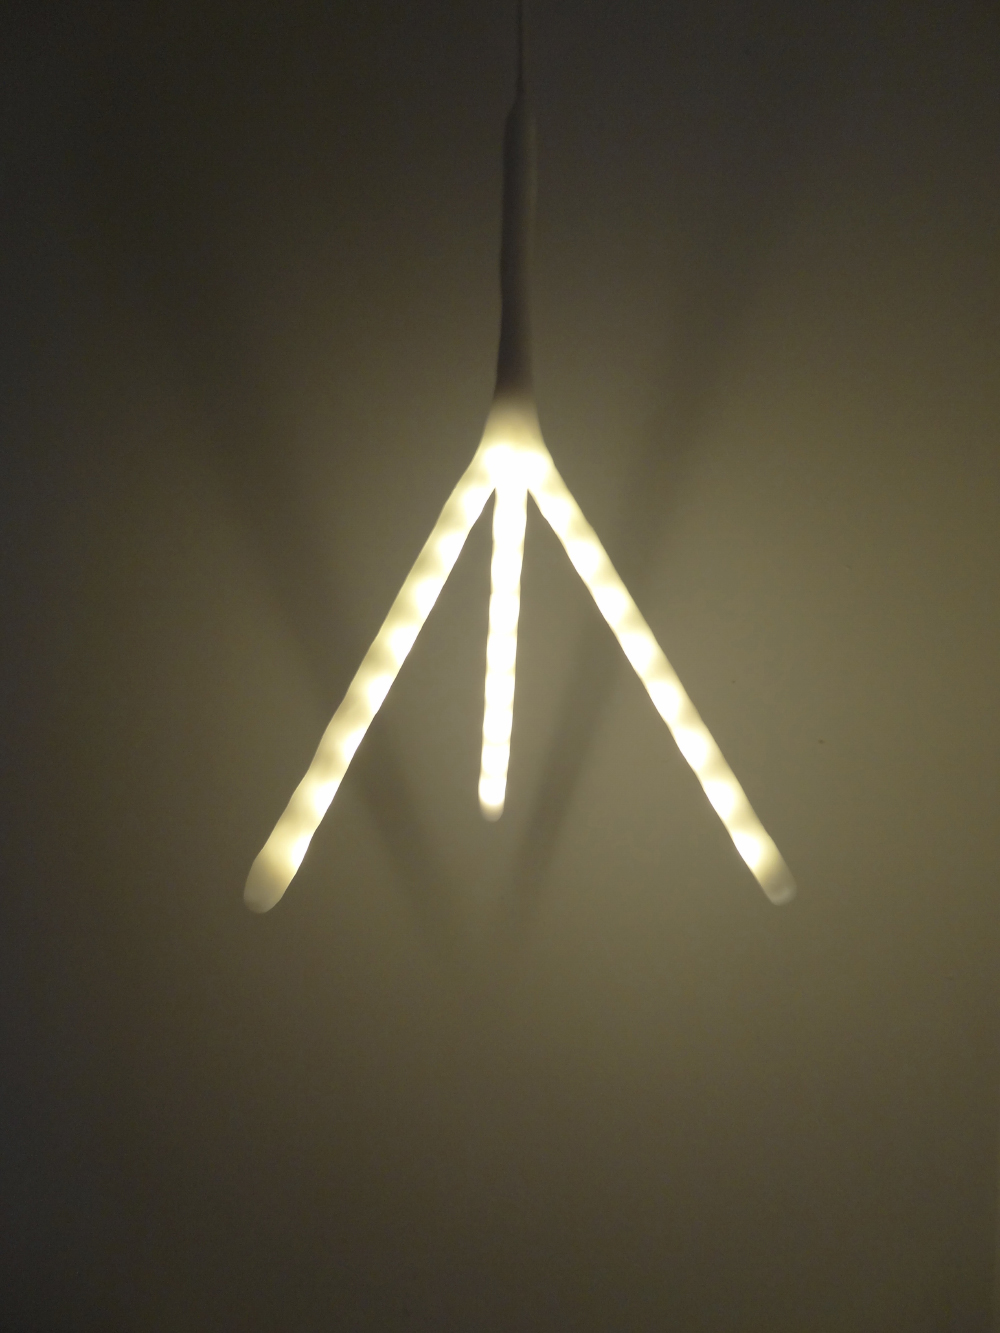 biobplastic lamp - Gerard de Hoop-01c